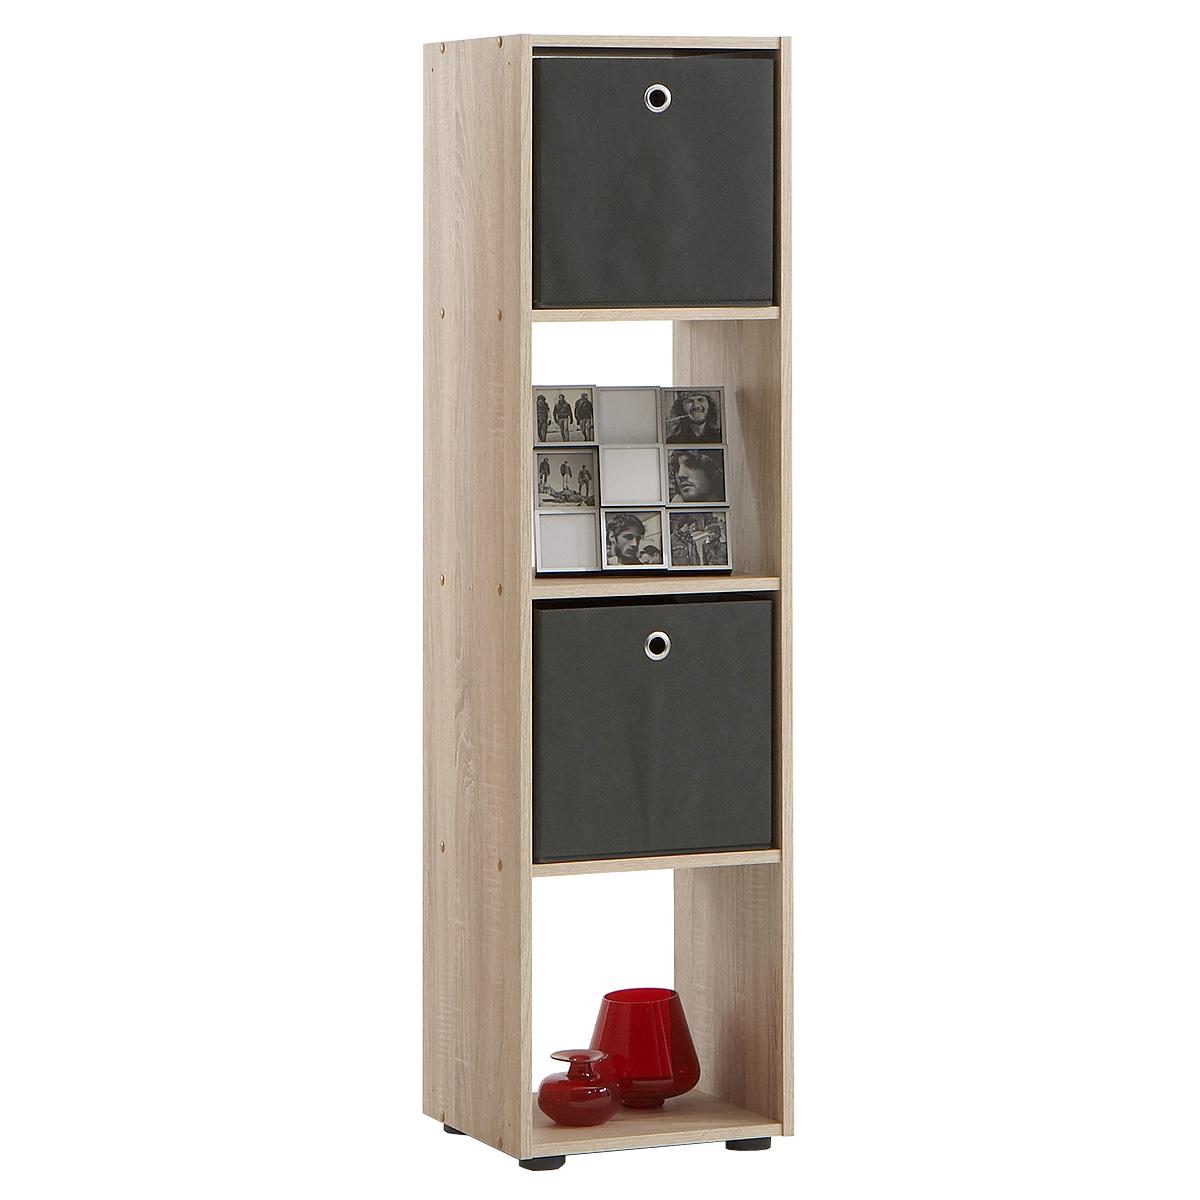 raumteiler mega 4 b cherregal regal in sonoma eiche s gerau neu ebay. Black Bedroom Furniture Sets. Home Design Ideas